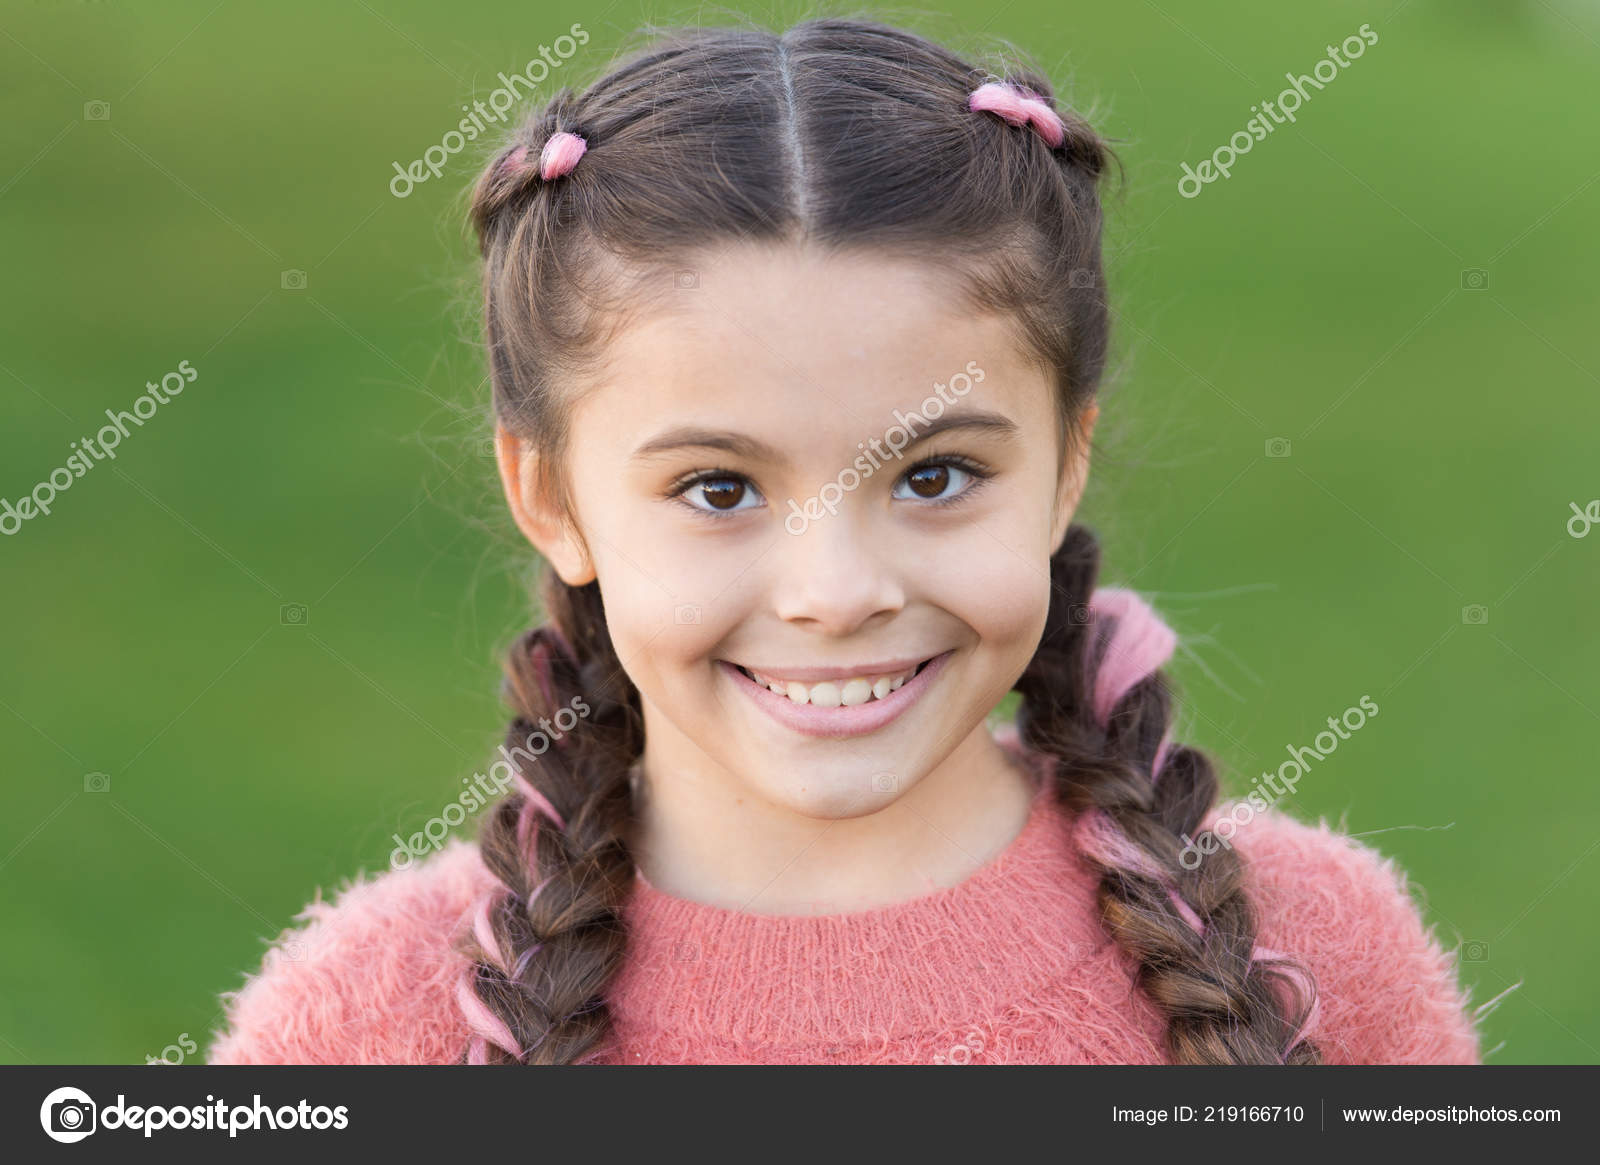 d8723050017 Φθινοπωρινή μόδα για το όμορφο κορίτσι. Ευτυχισμένη παιδική ηλικία.  Φθινόπωρο snuggles. Άνετα και όμορφα. Ευτυχισμένη κοριτσάκι στο Φθινοπωρινό  πουλόβερ.